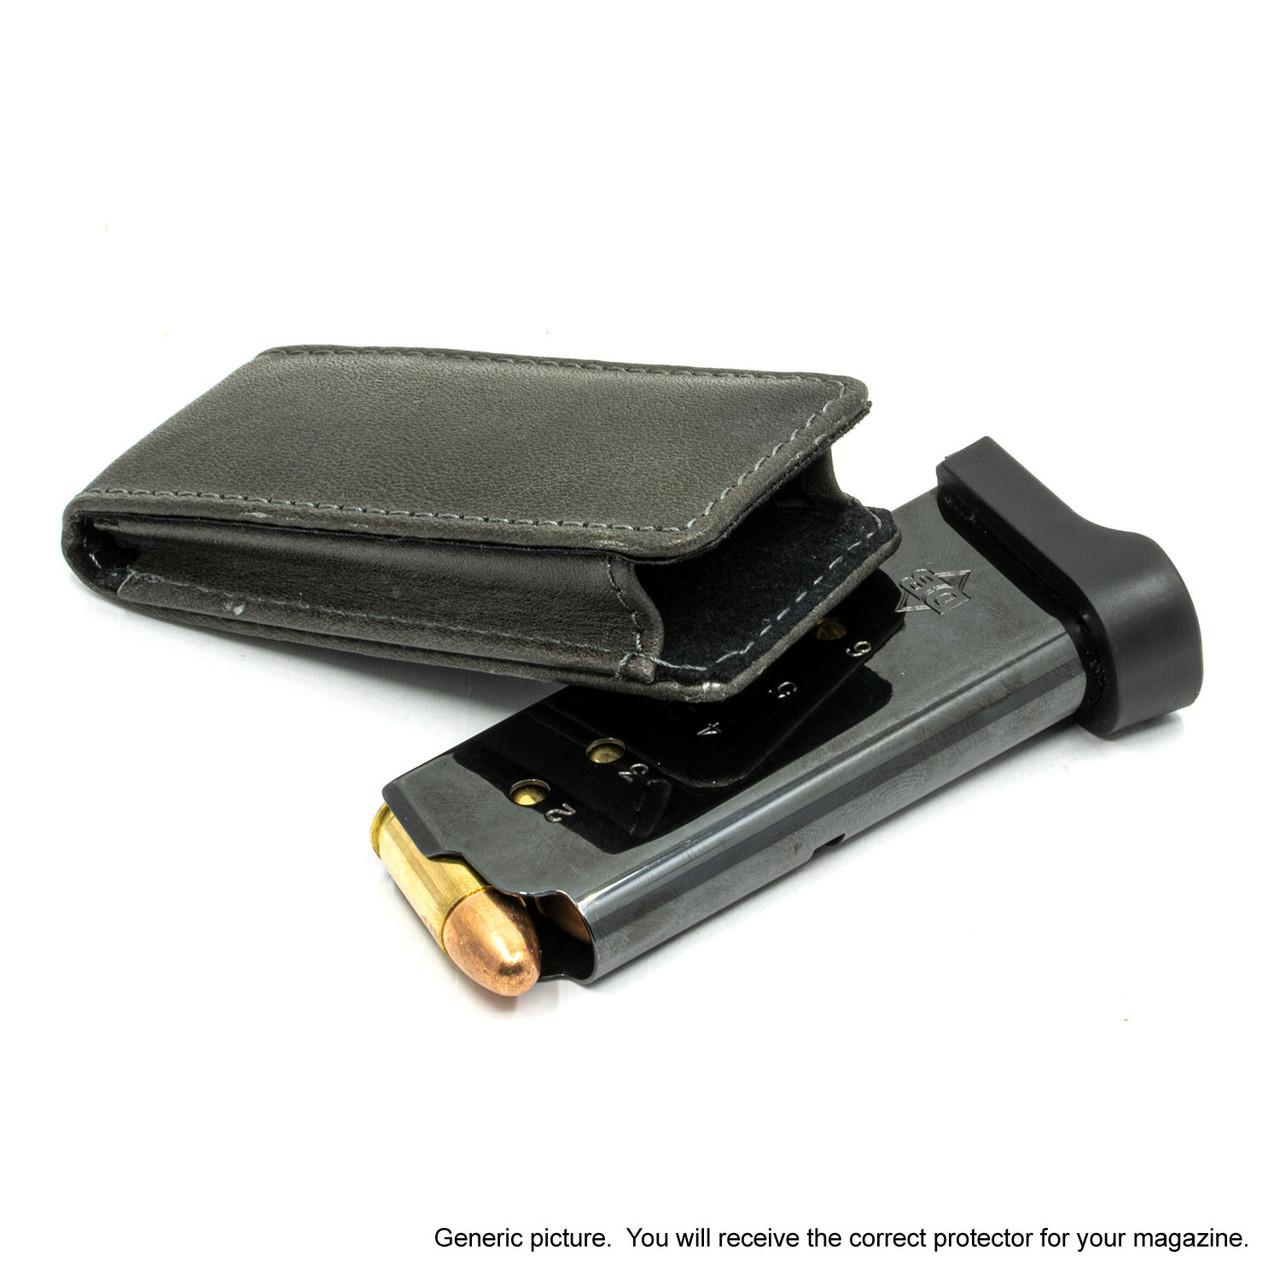 Taurus Millennium Pro 140 Black Freedom Magazine Pocket Protector